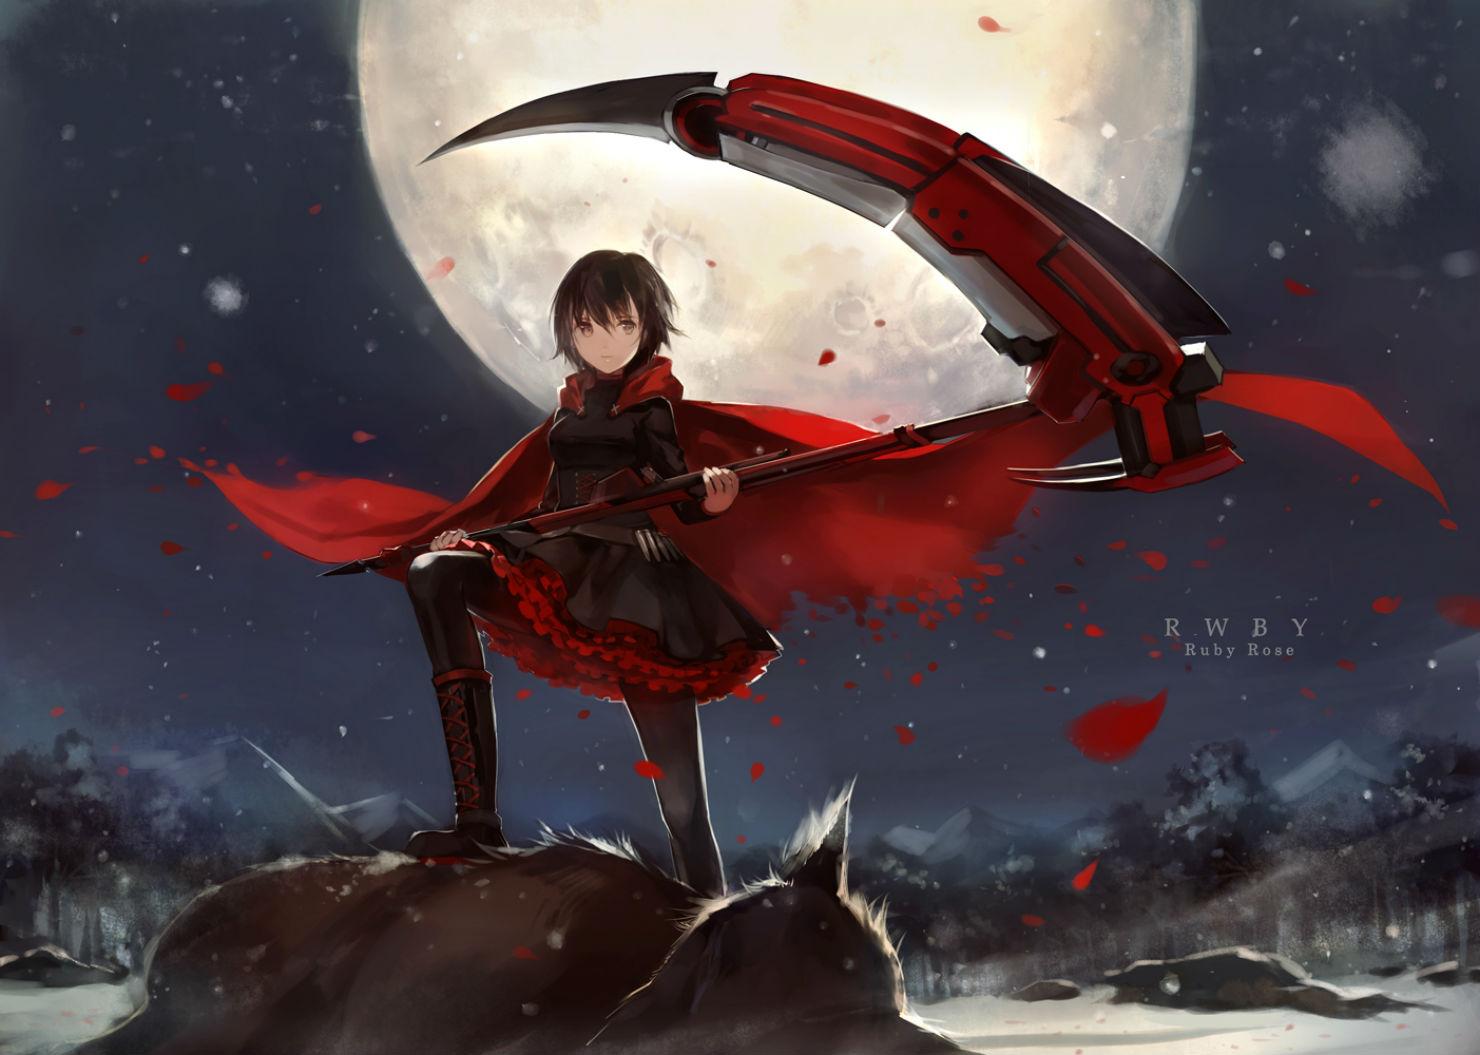 rwby anime scythe wallpaper - photo #5